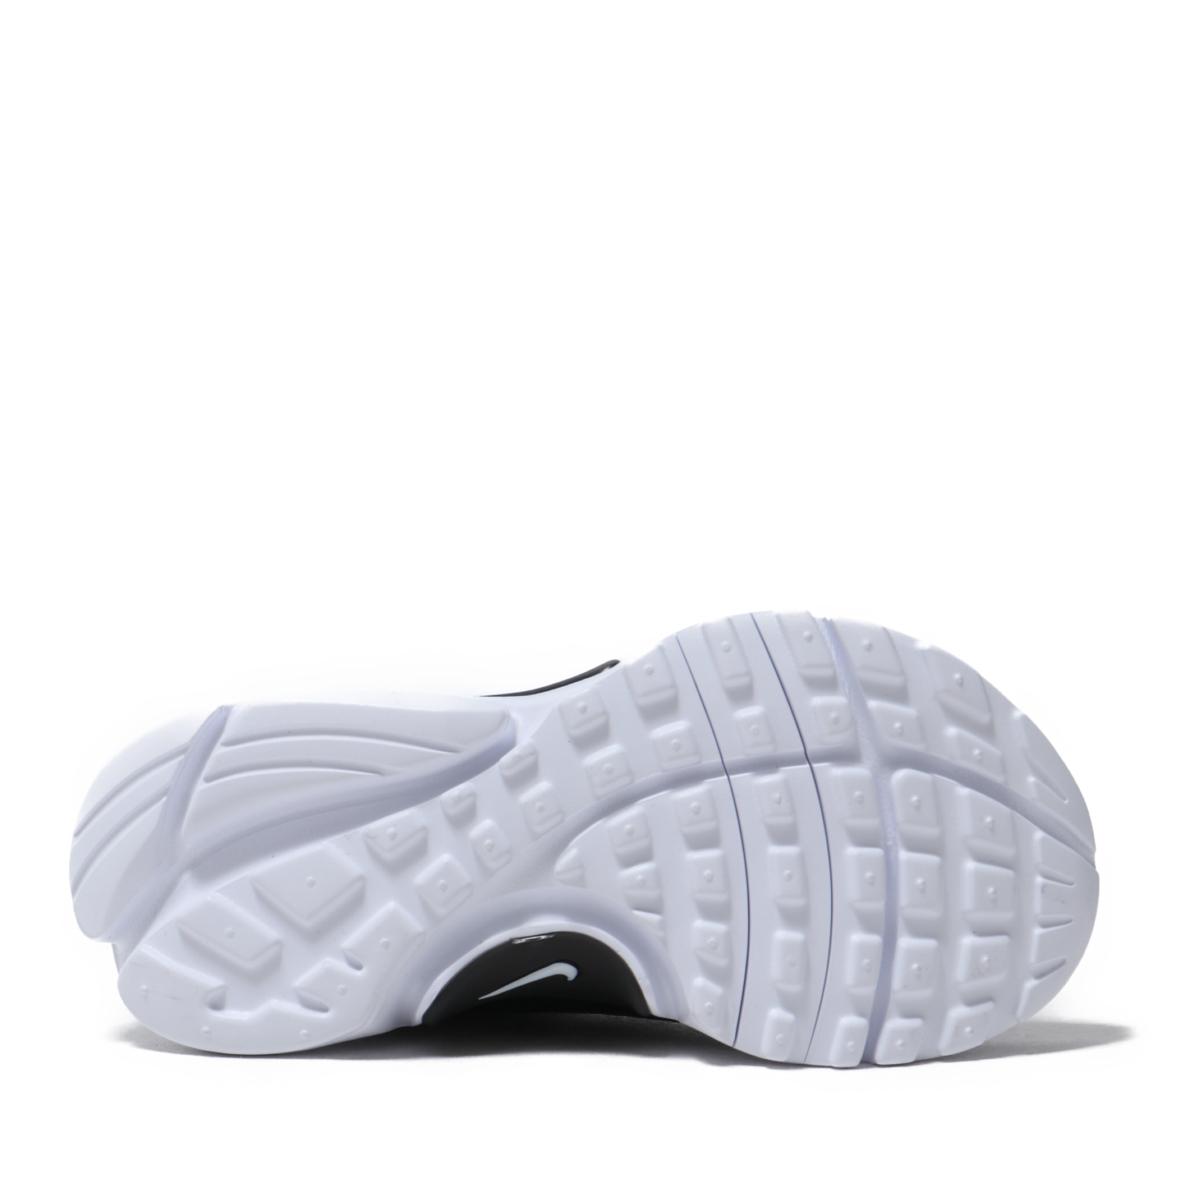 6d3996ba4 NIKE PRESTO EXTREME (PS) (Nike presto extreme PS) BLACK BLACK-METALLIC GOLD-WHITE  18FA-I